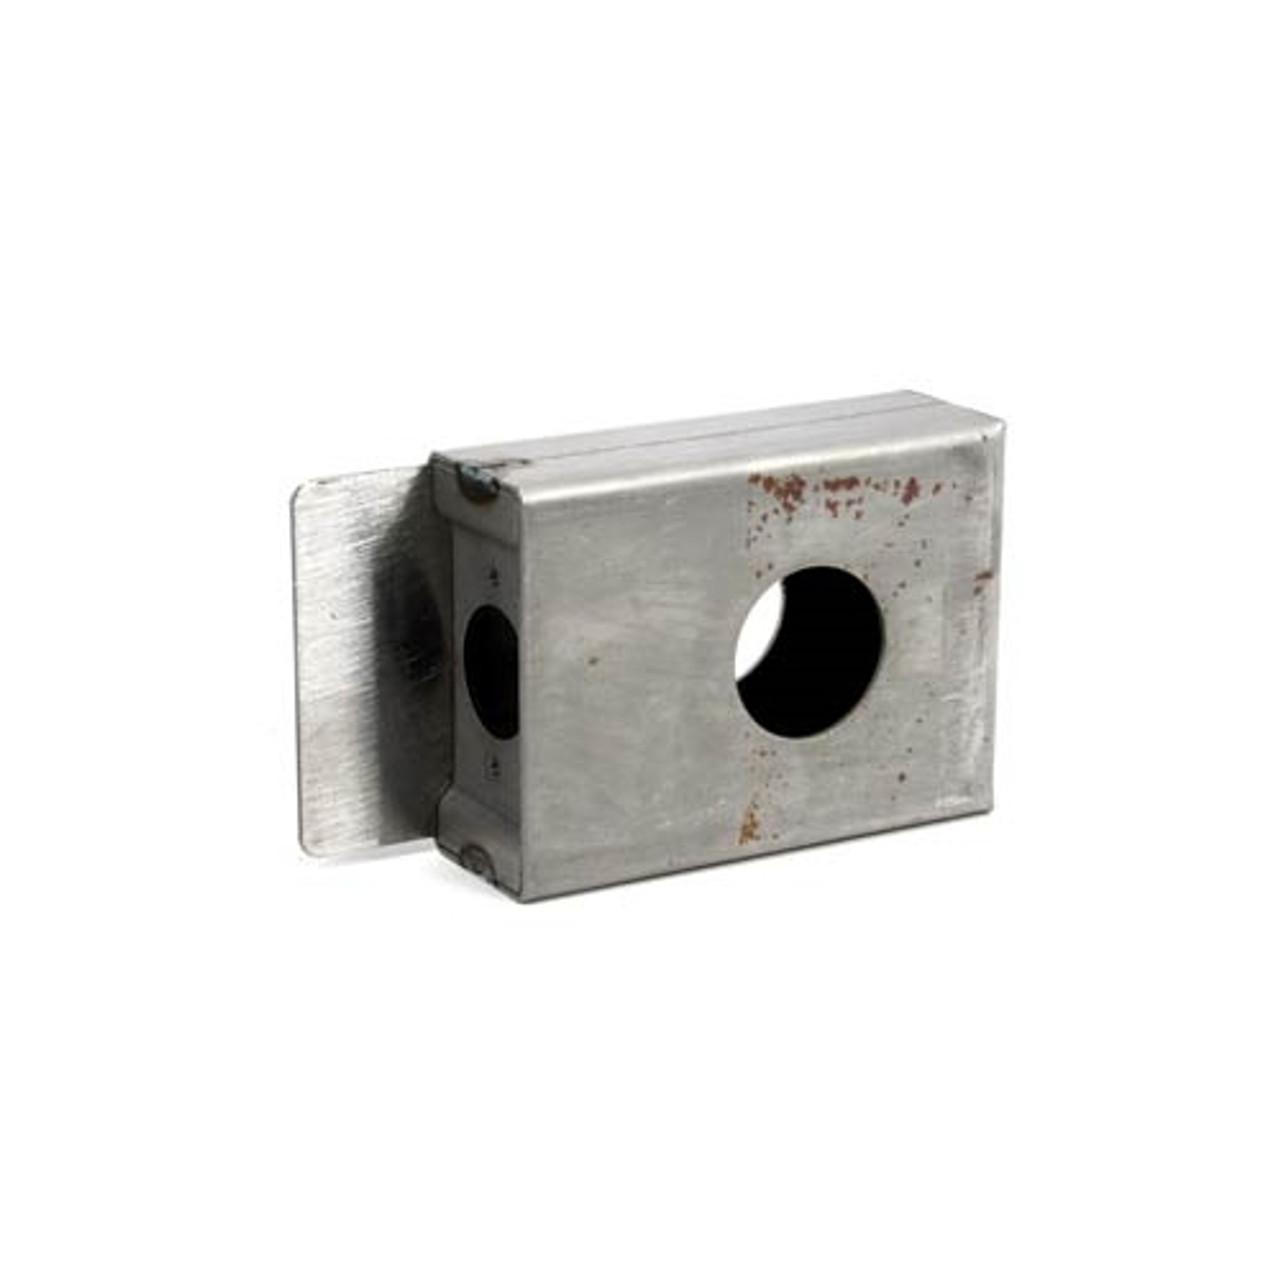 Keedex K Bxsgl234112 Cylindrical Hole 1 1 2 Weldable Box